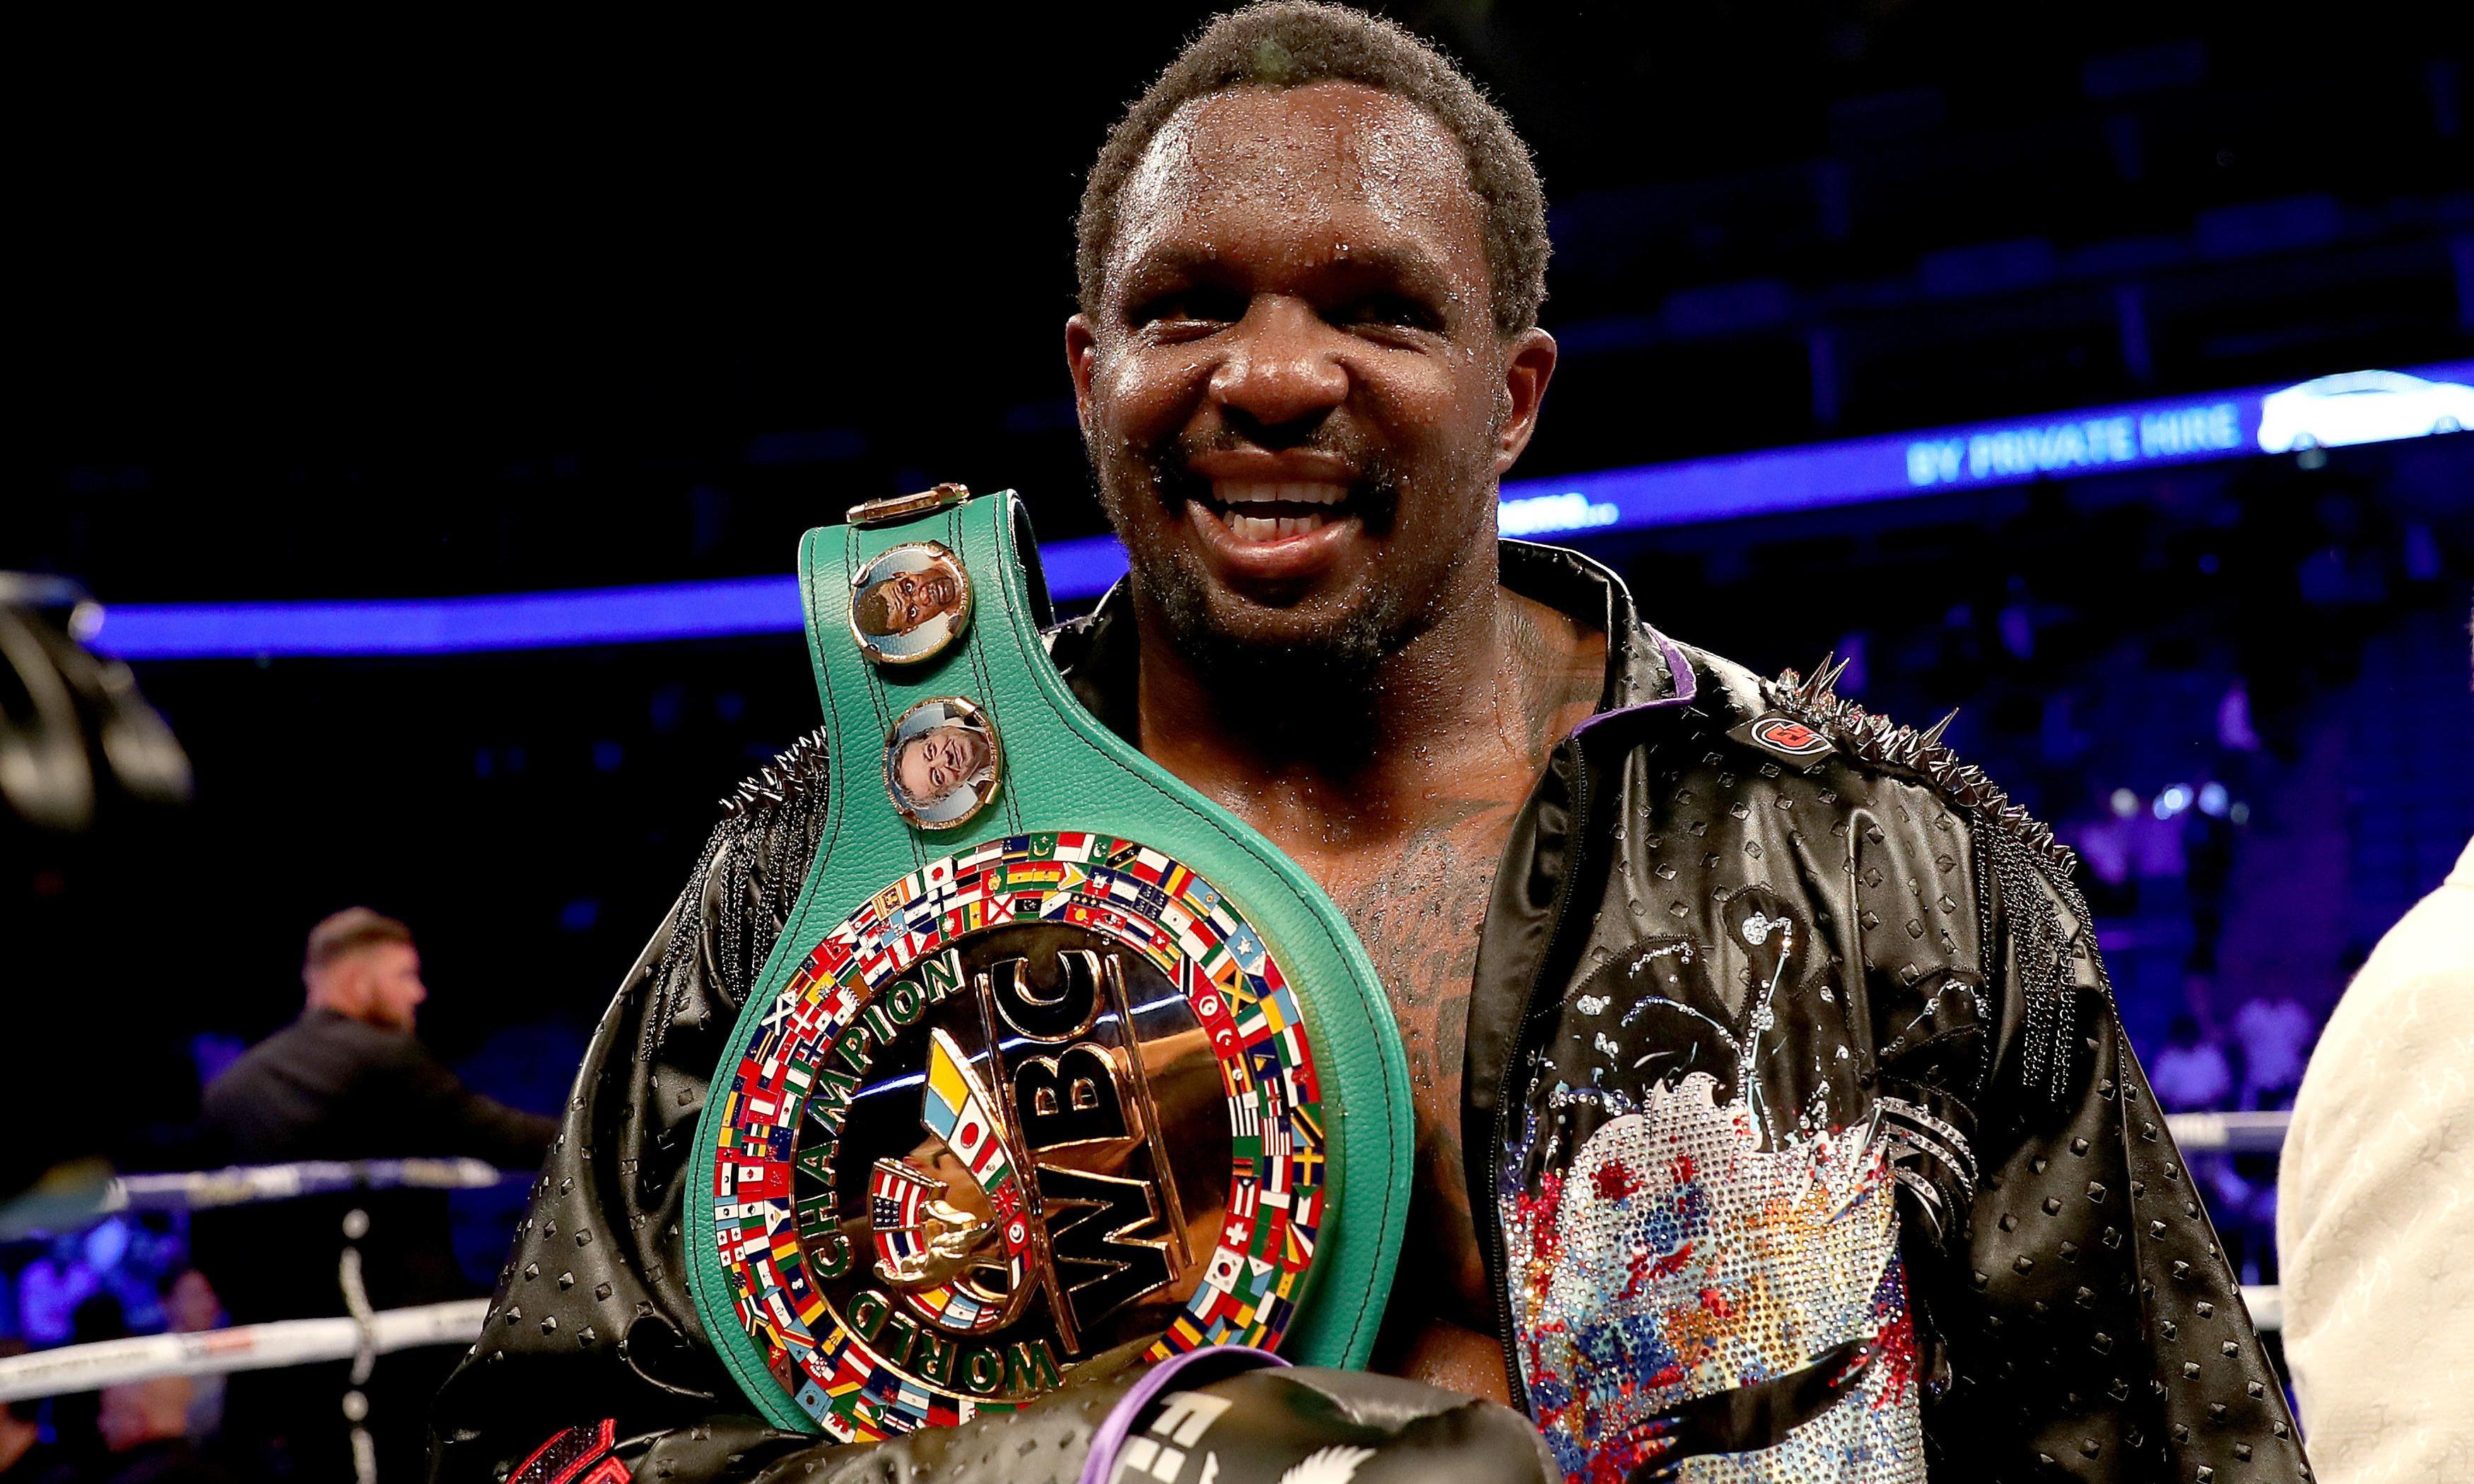 Dillian Whyte claims interim WBC heavyweight title with win over Óscar Rivas